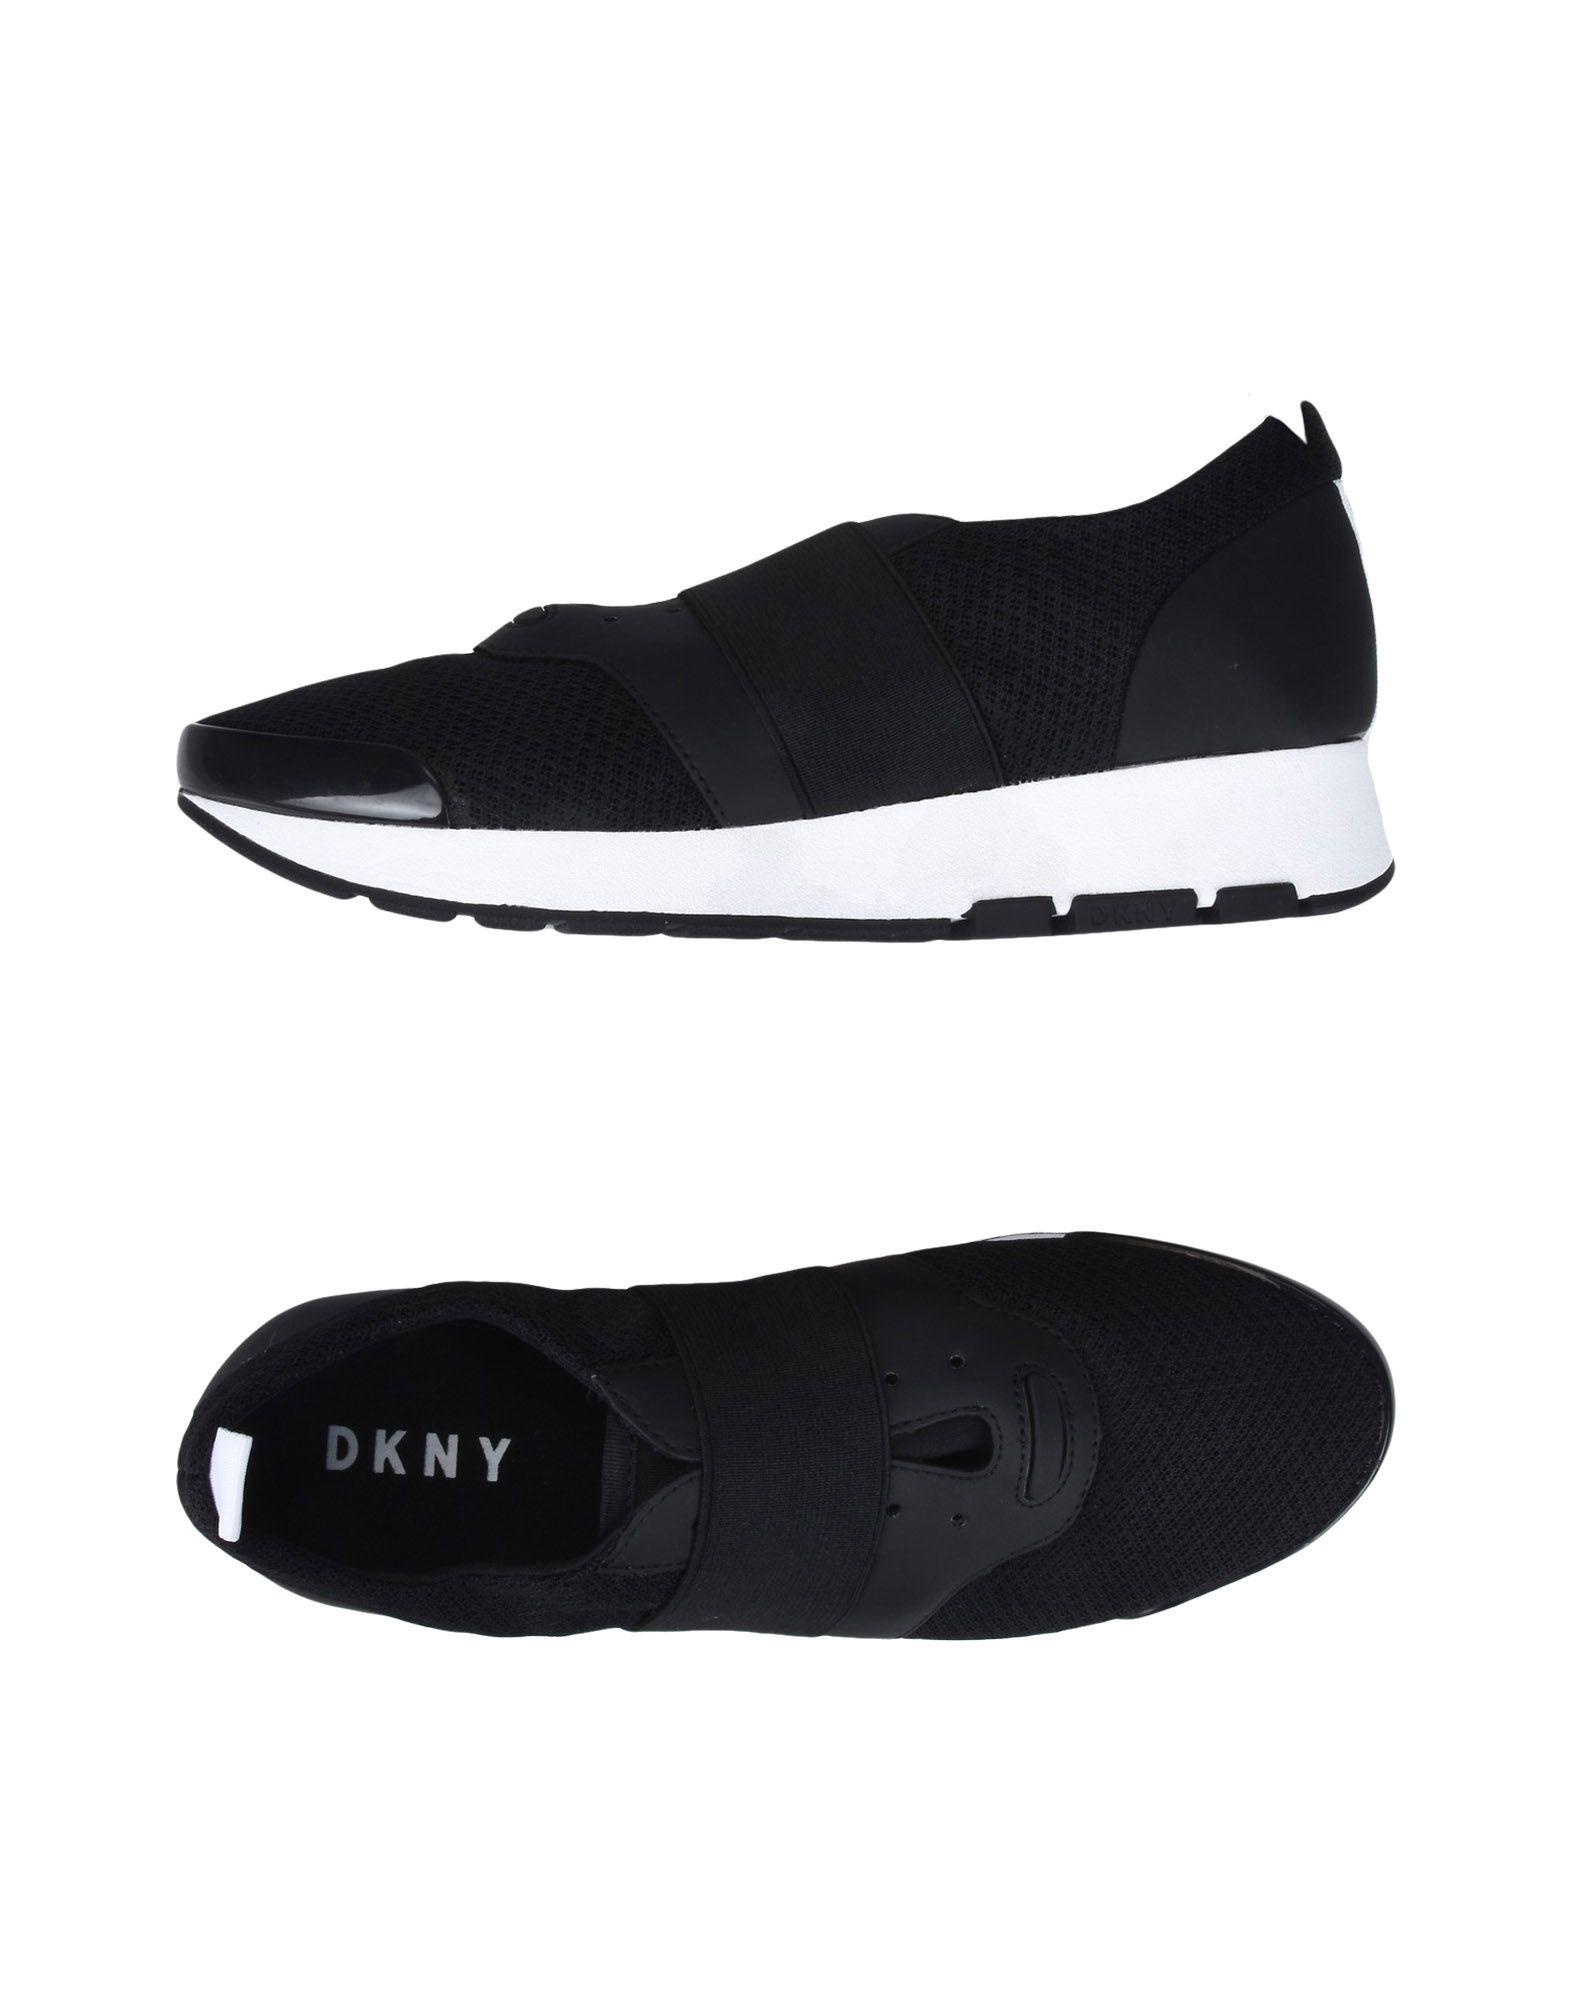 Moda Sneakers Dkny Donna 11489668VV - 11489668VV Donna a6d64f